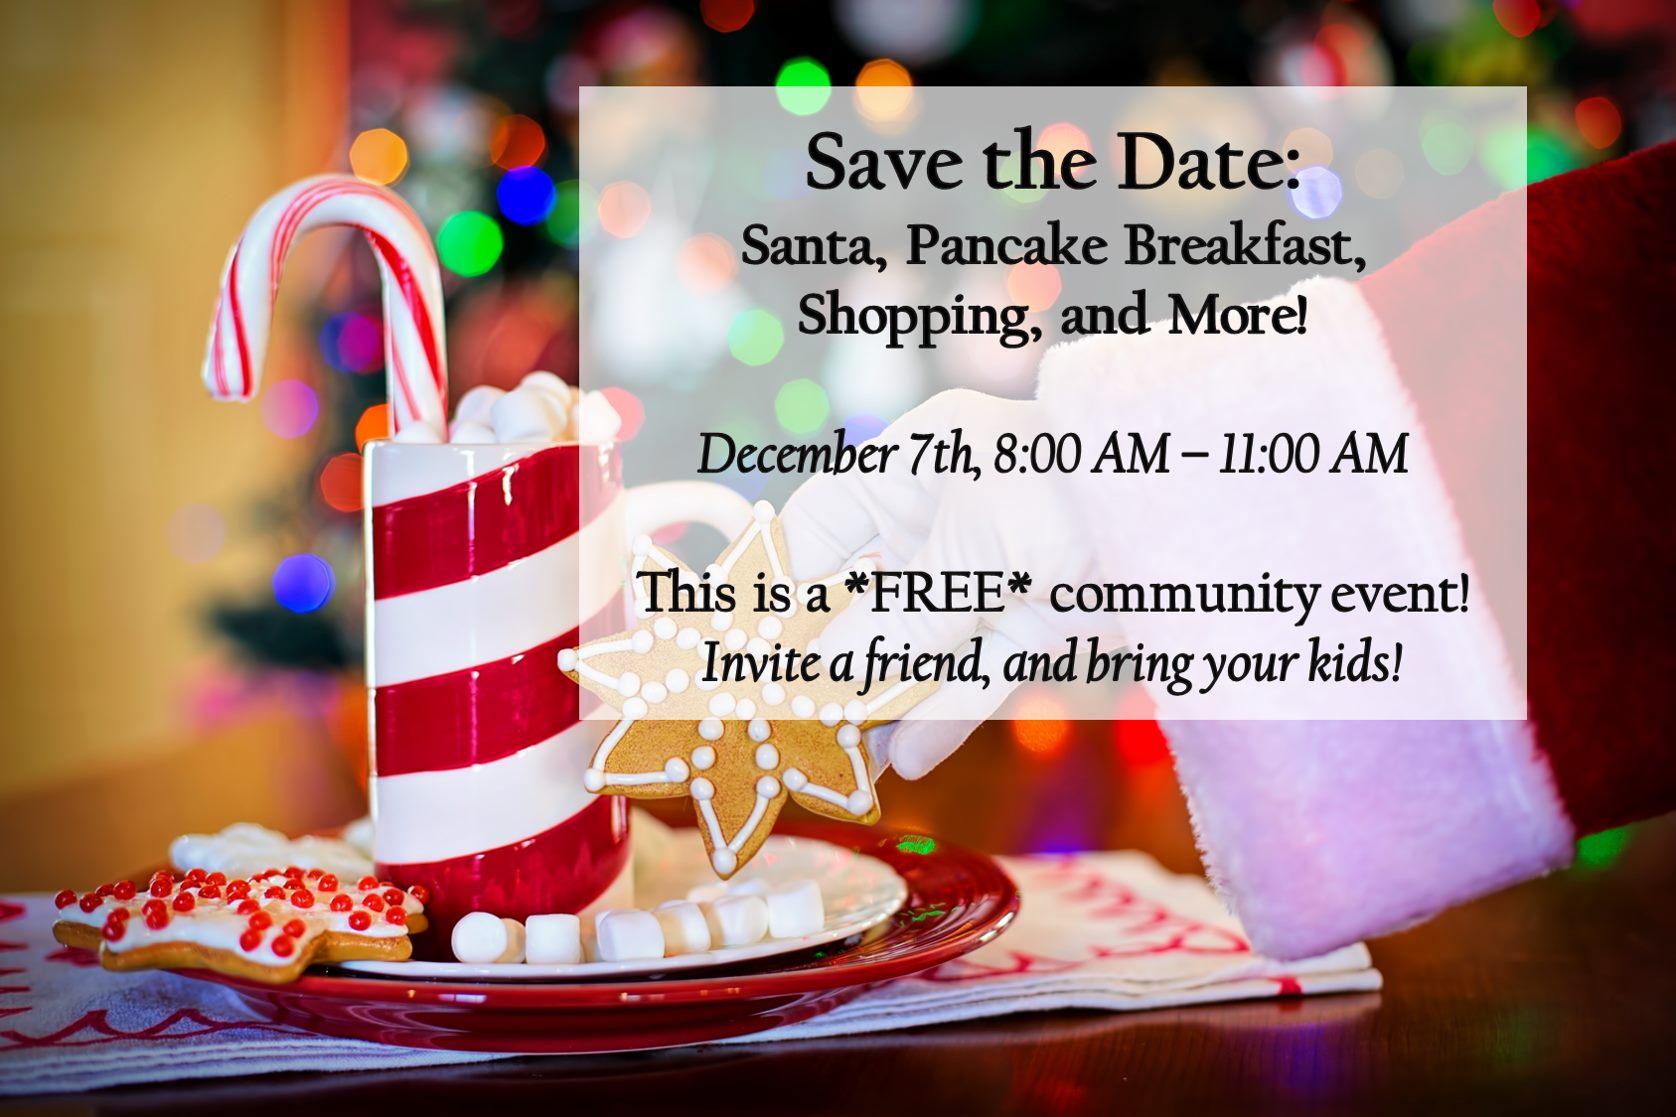 Free Santa Breakfast and more